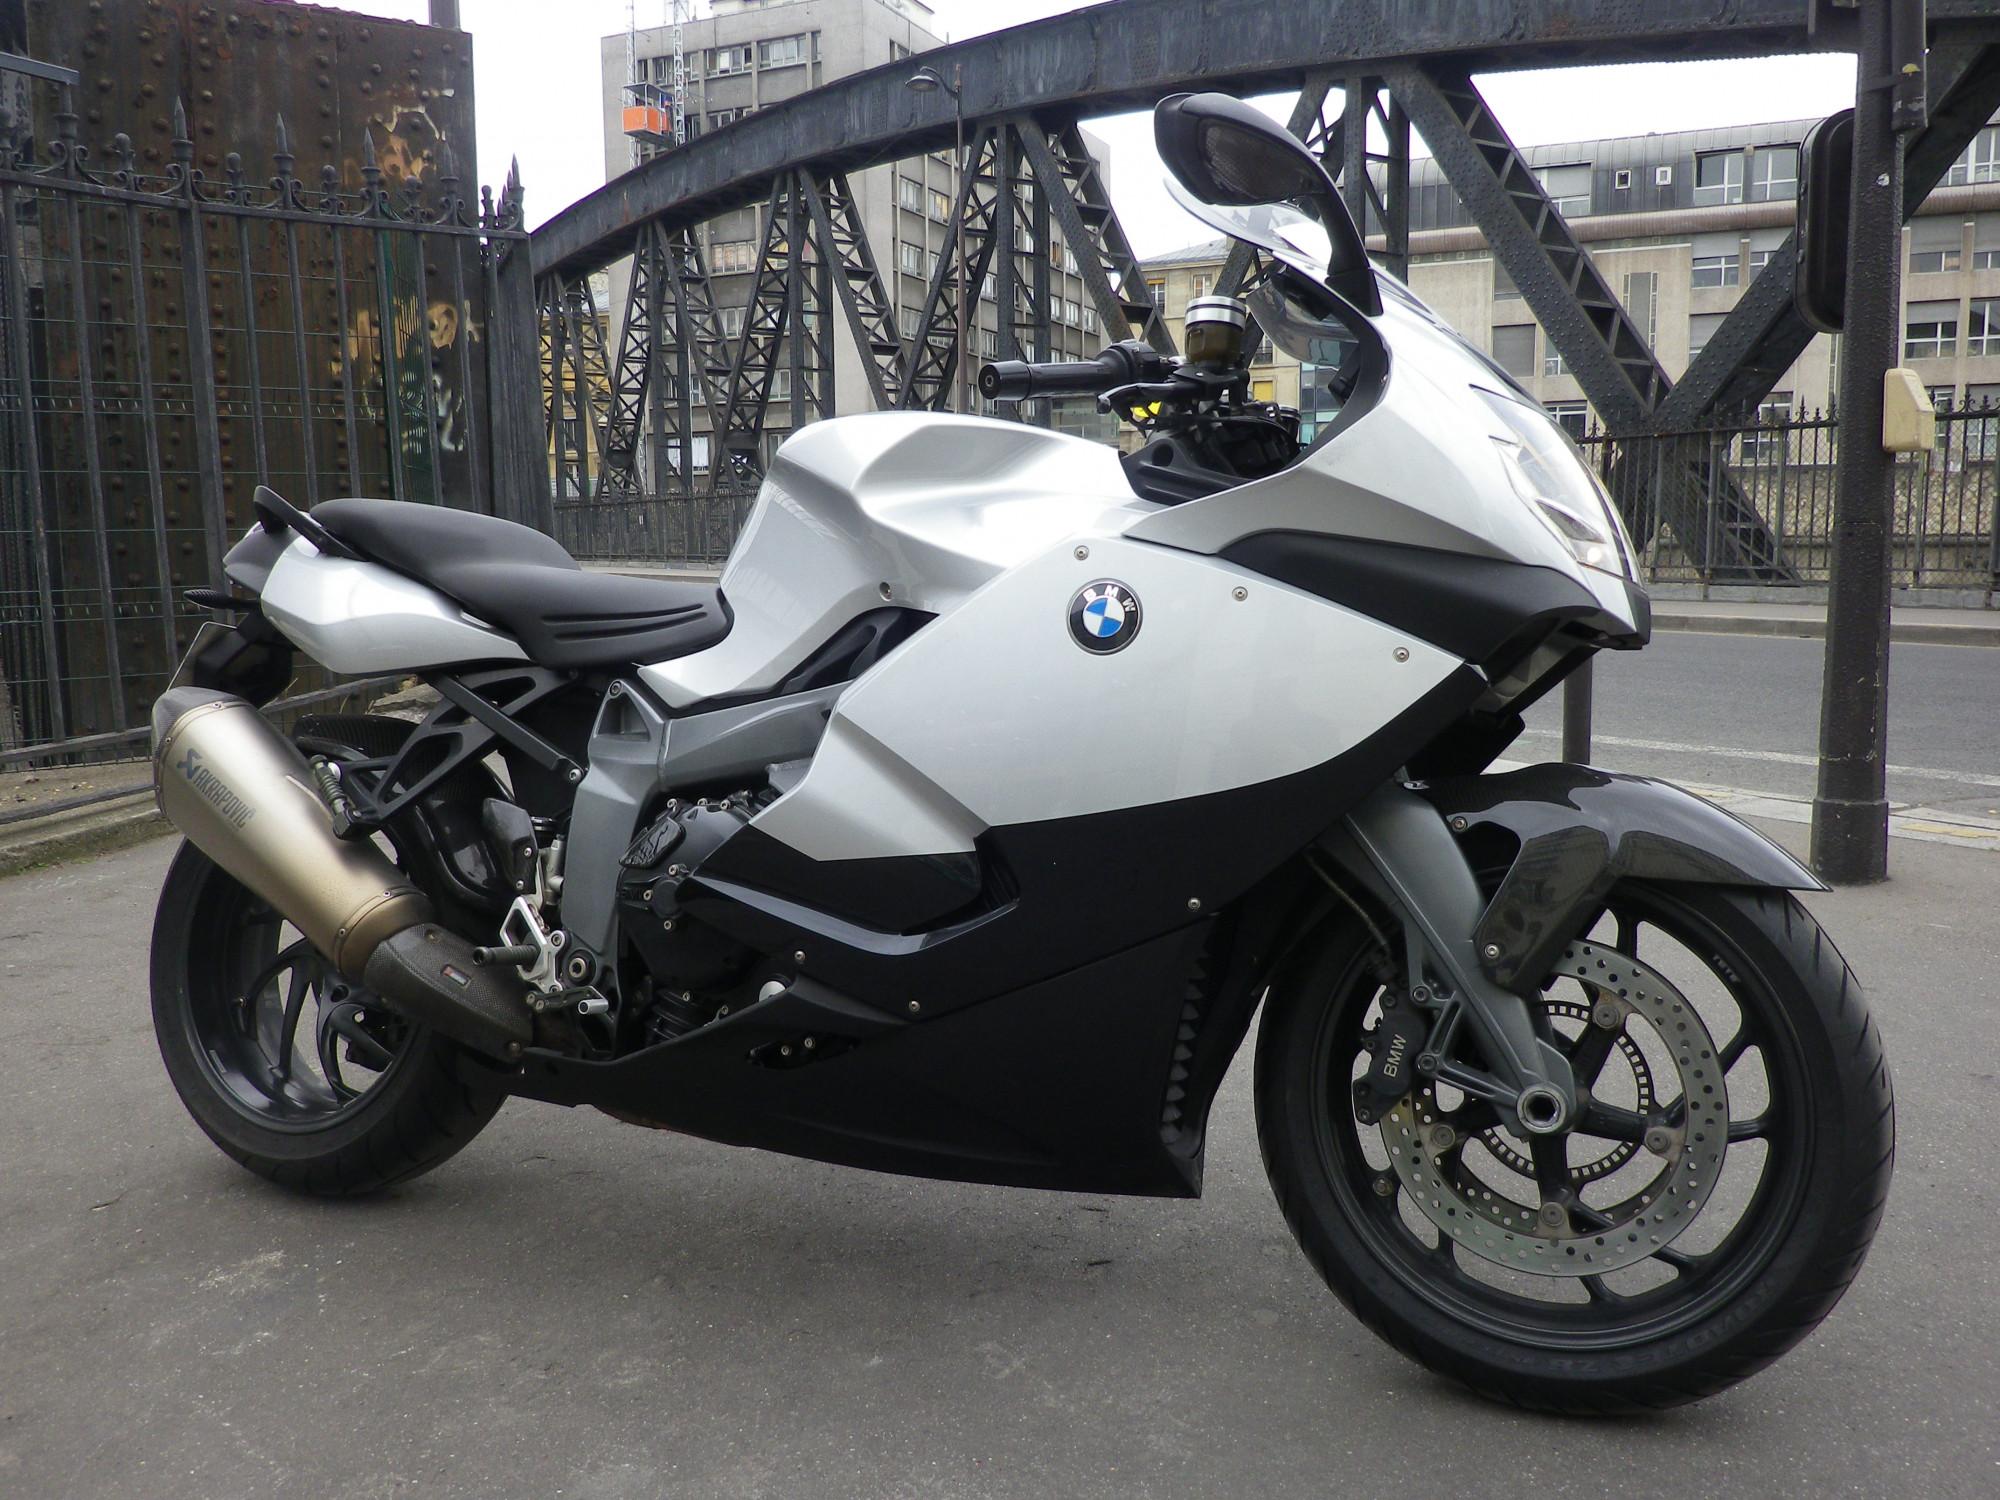 Moto bmw k1300s occasion belgique